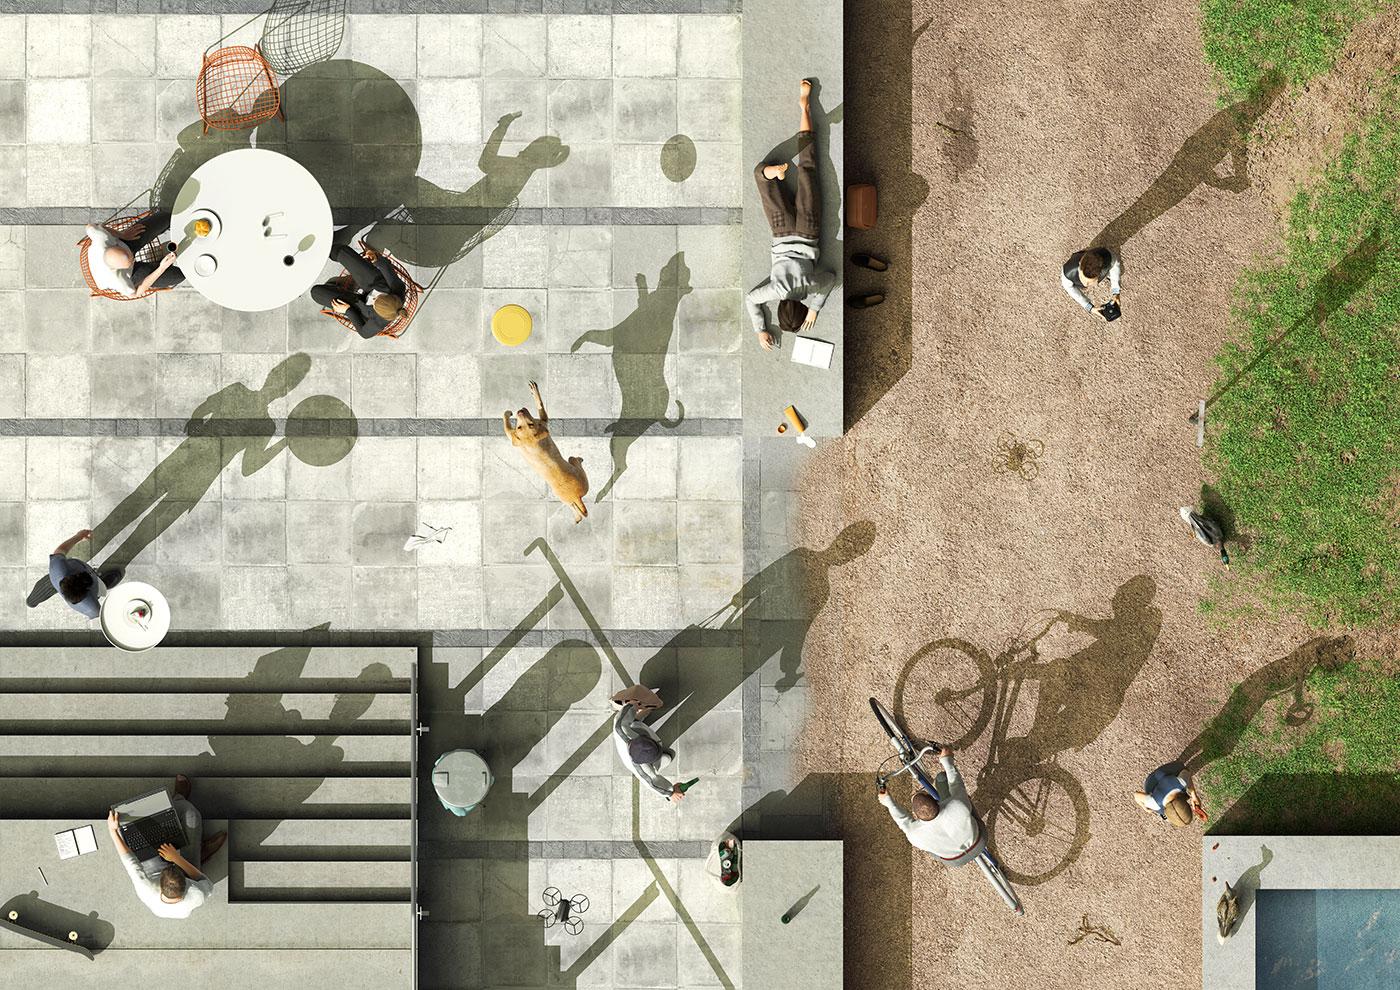 IBA'27: Illustration (IBA'27 / L2M3 / Max Guther)